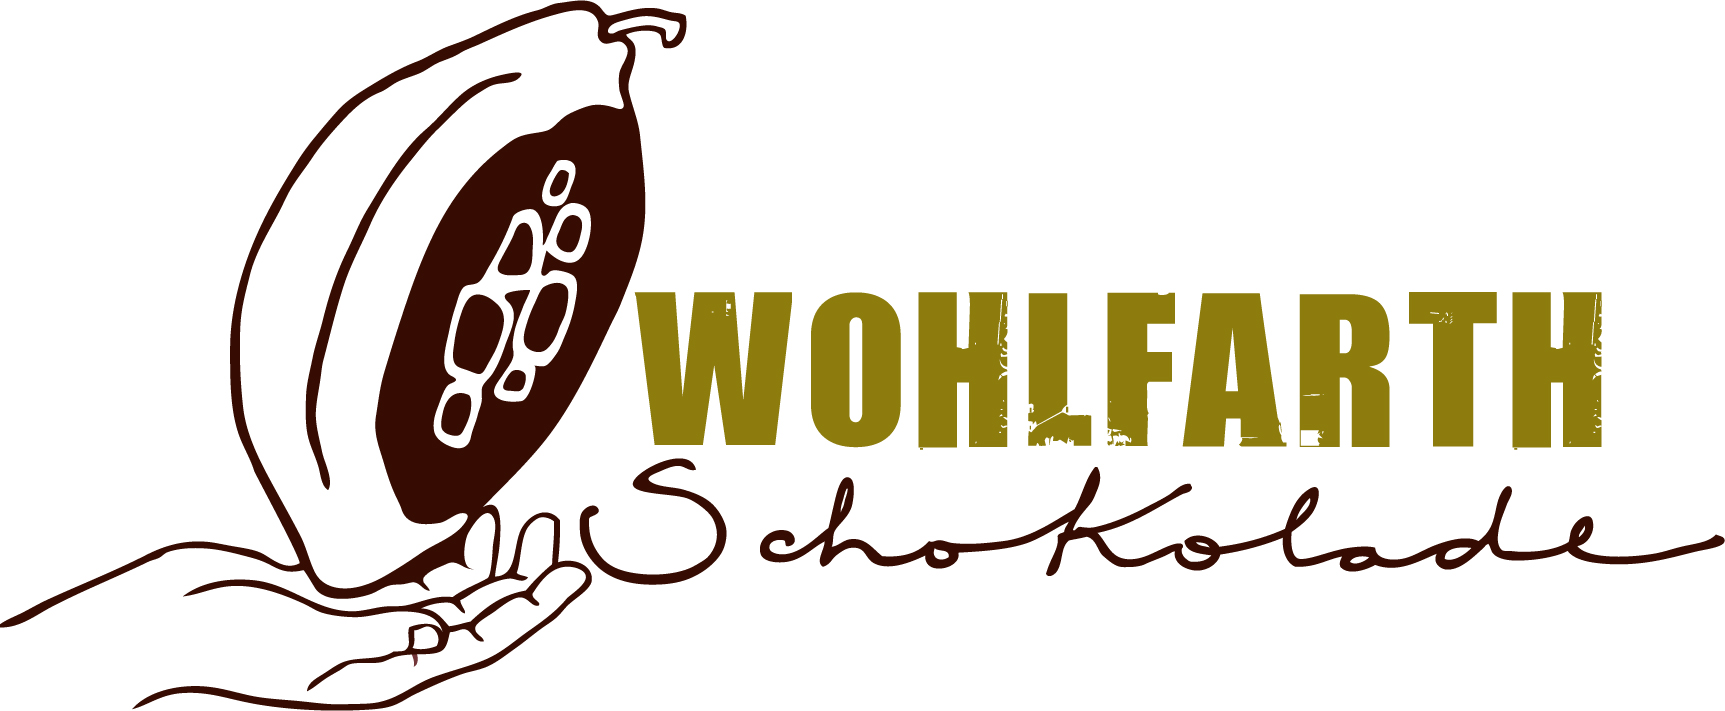 Wohlfarth Schokolade Berlin-Logo